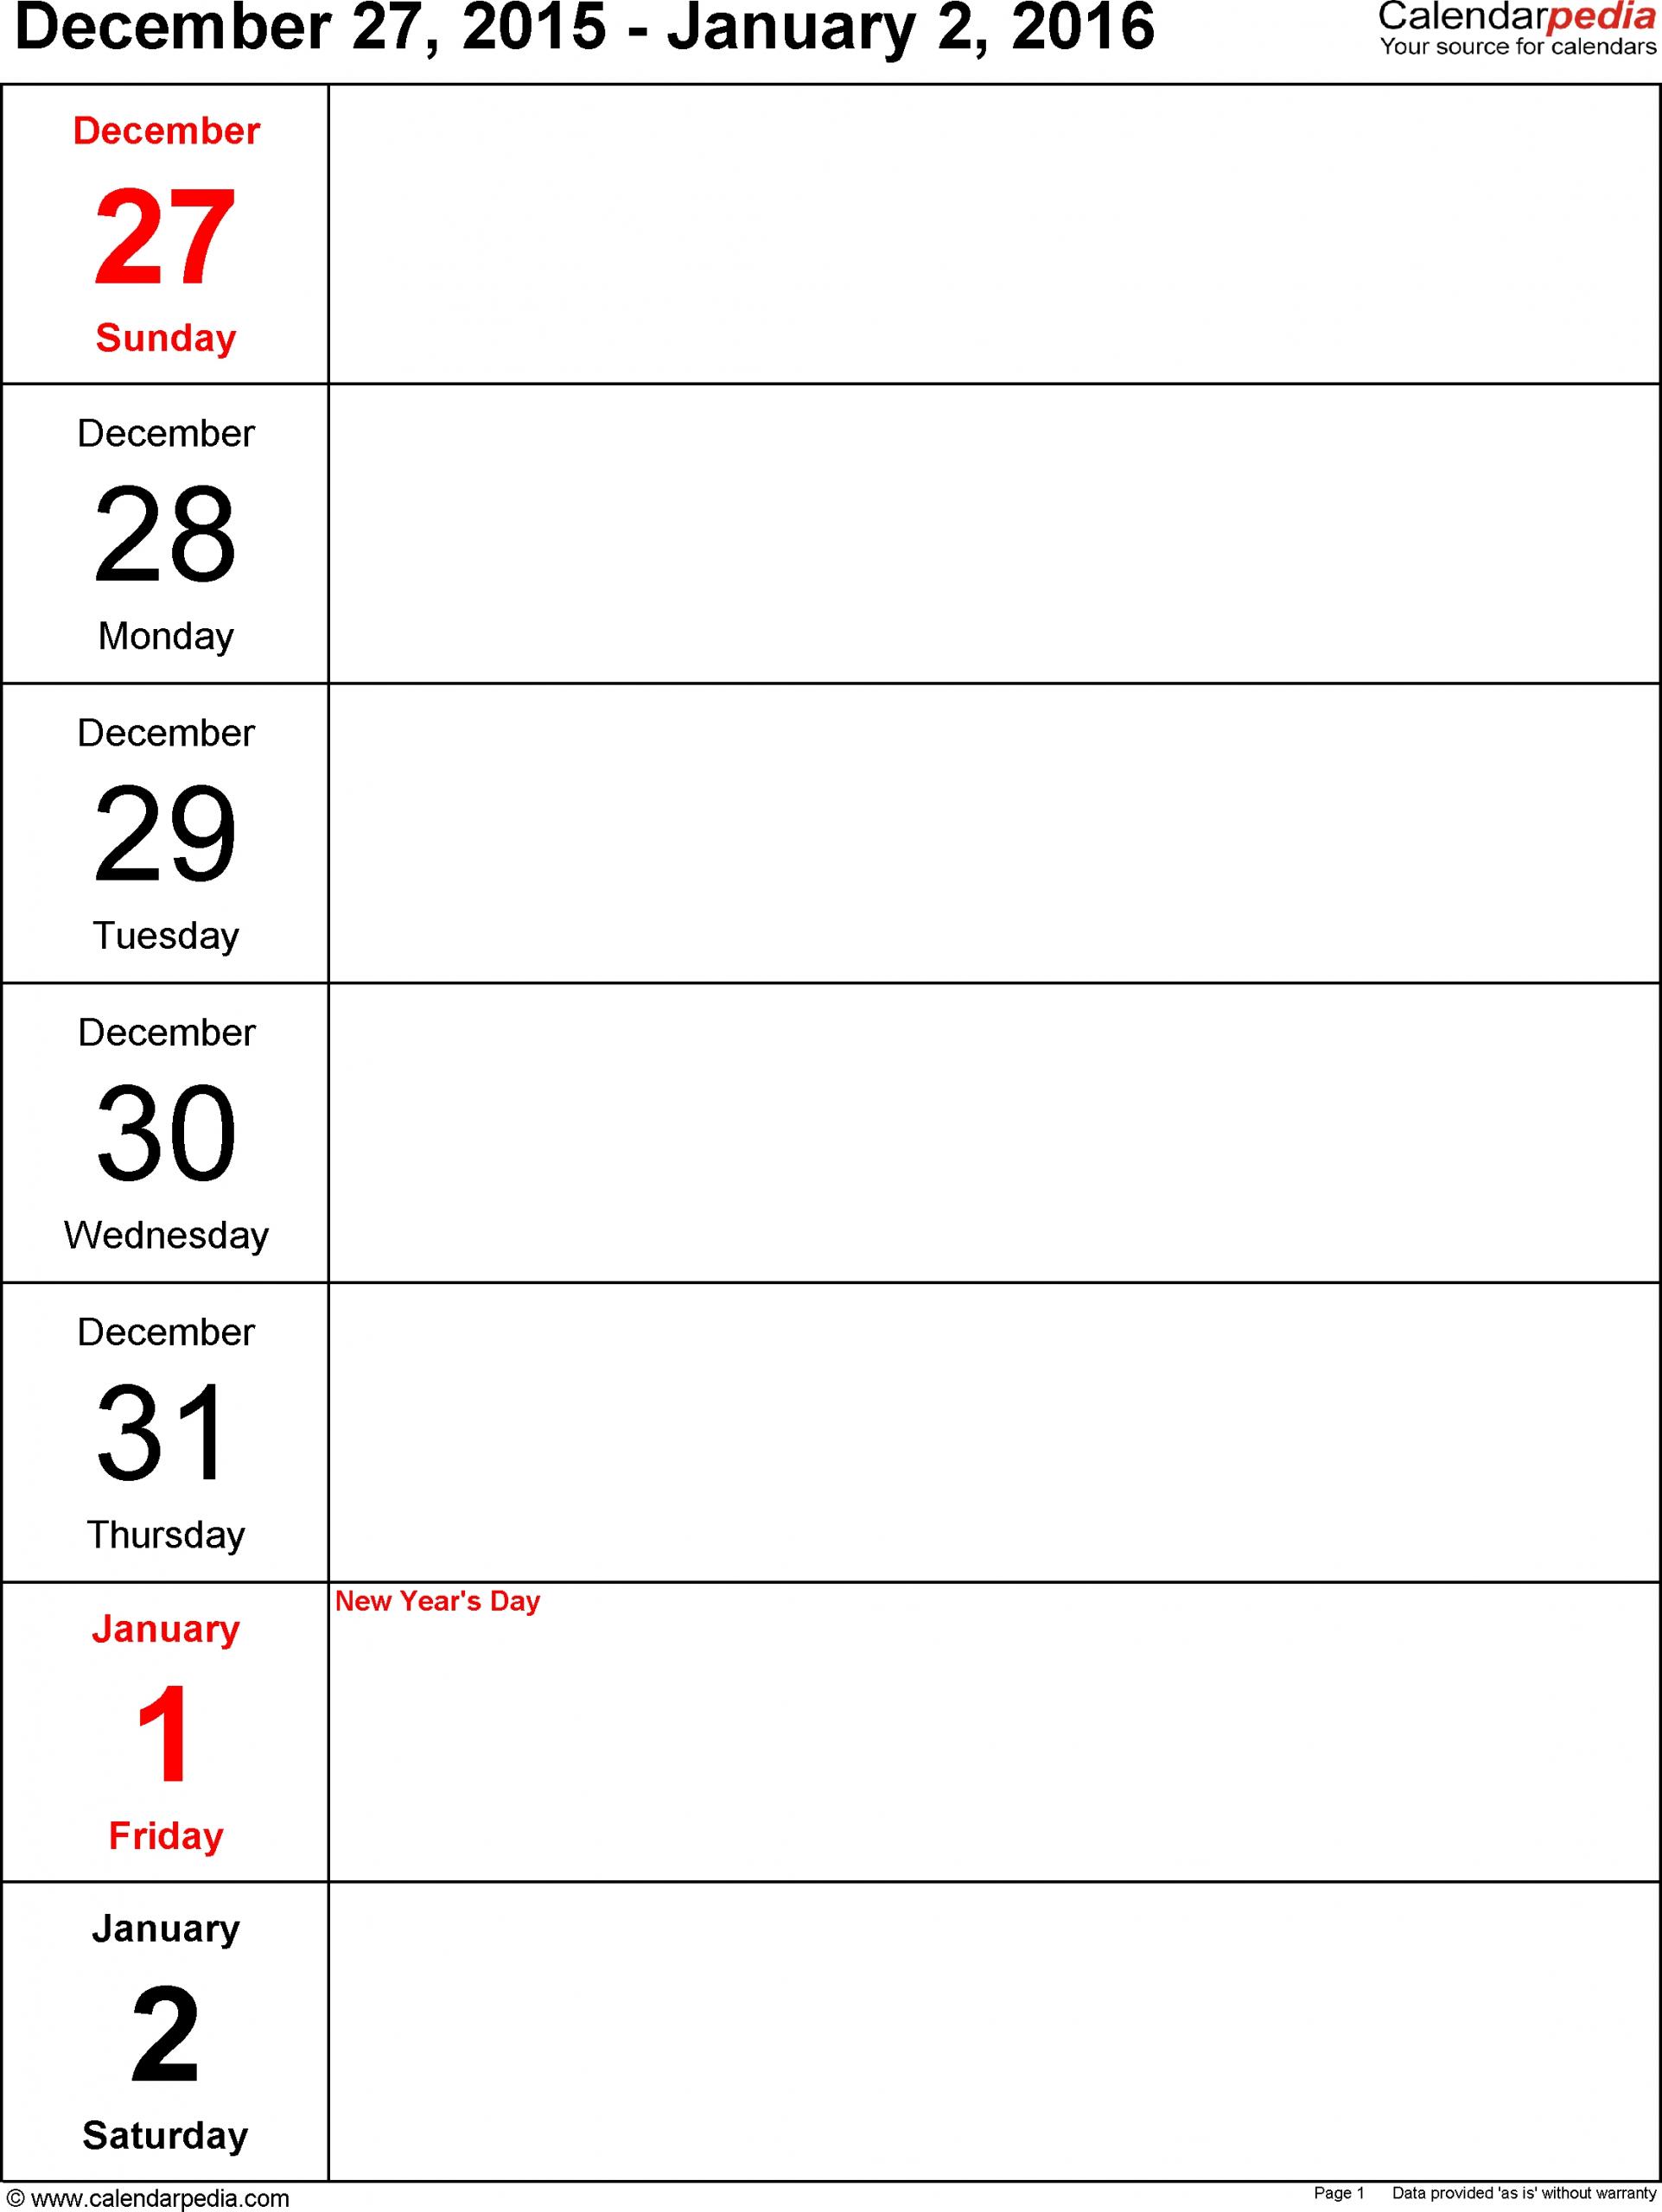 5 Day Weekly Calendar Printable | Printable Calendar 5 Day Monthly Calendar Template Word